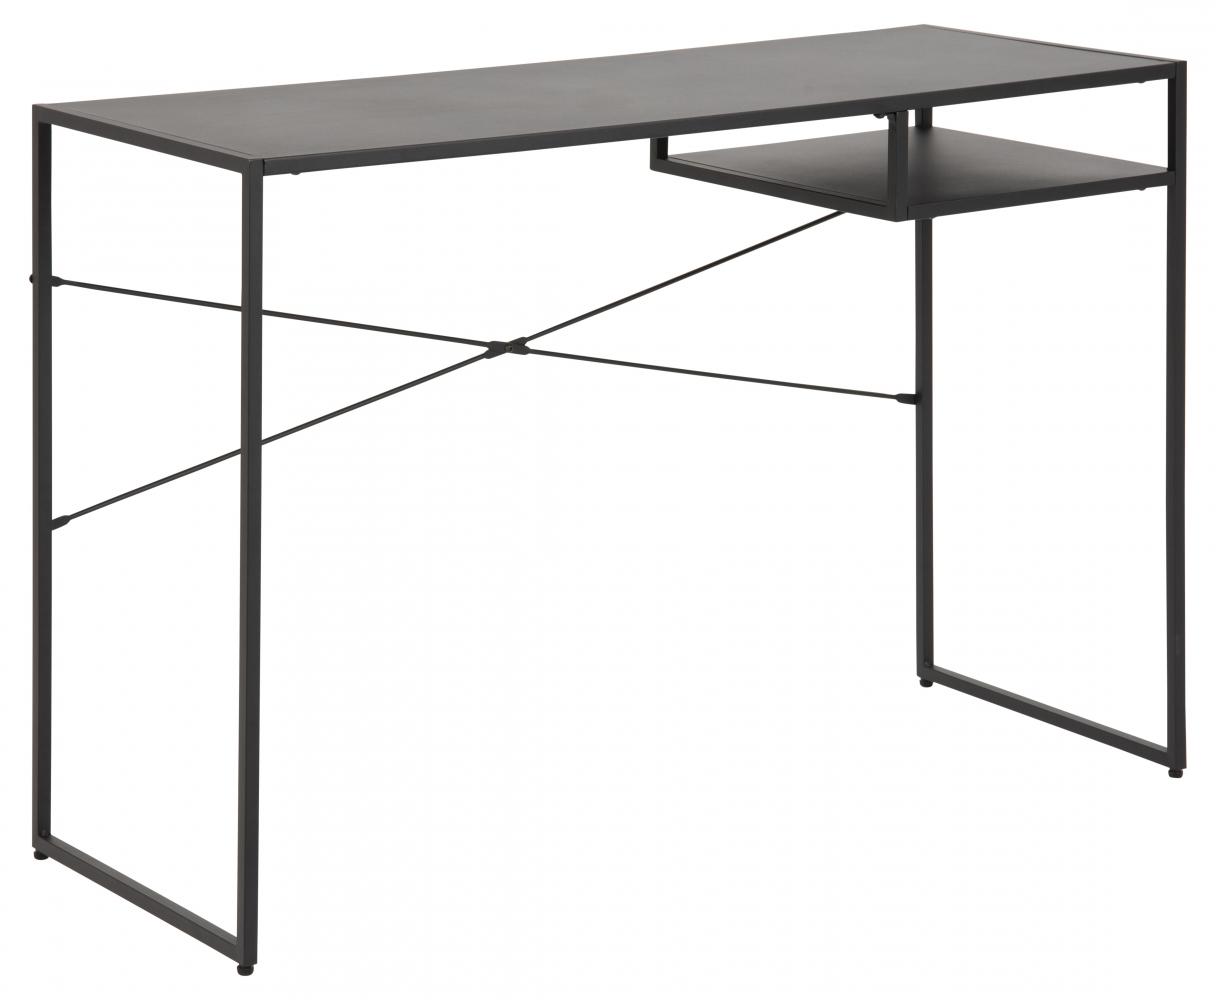 Pracovní stůl Newcastle, 110 cm, kov, černá